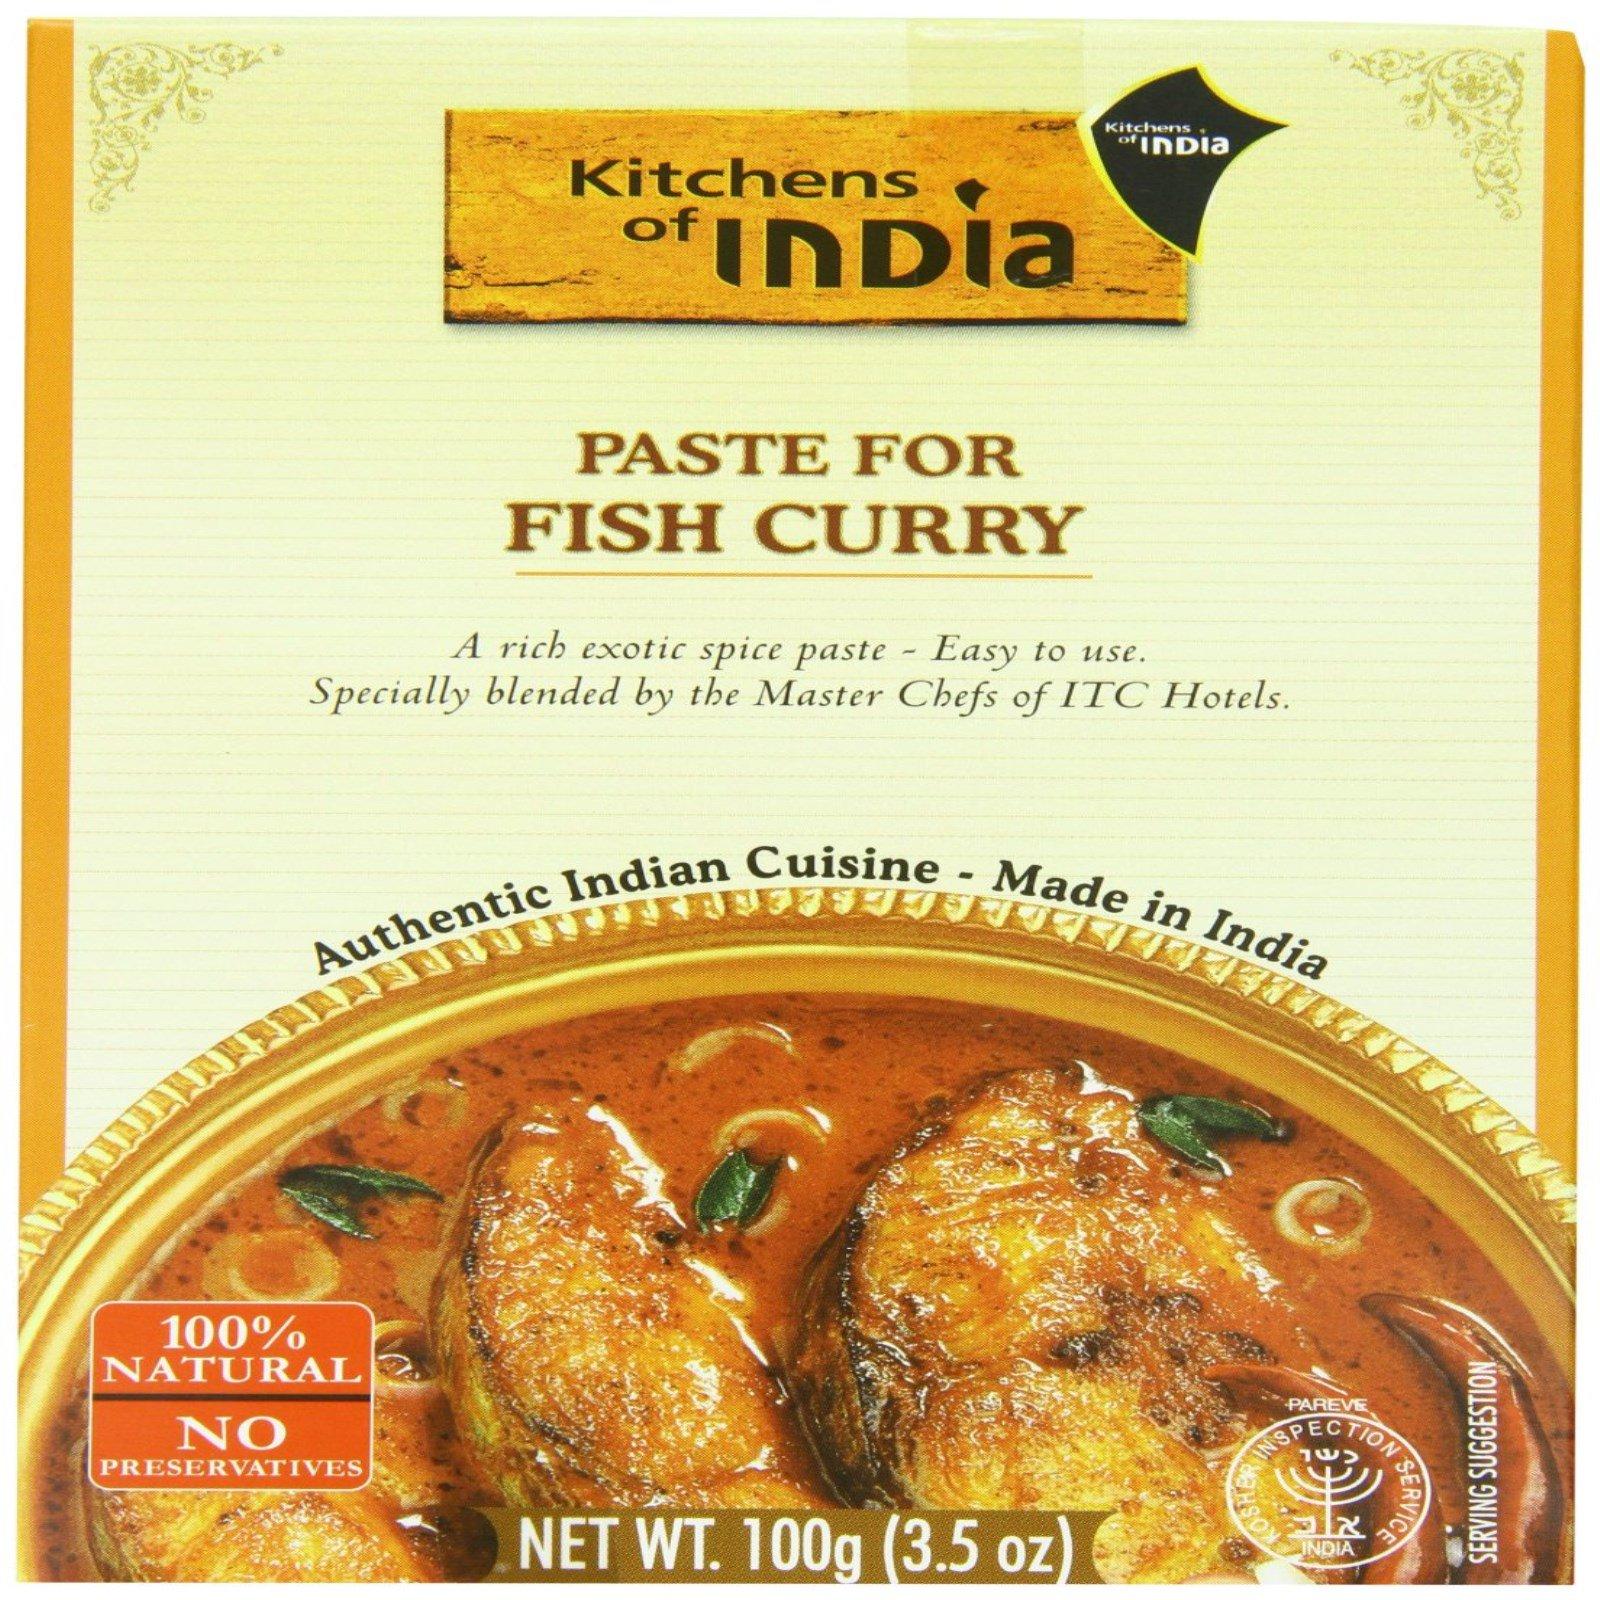 kitchens of india cheap backsplash for kitchen paste fish curry 3 5 oz 100 g iherb com